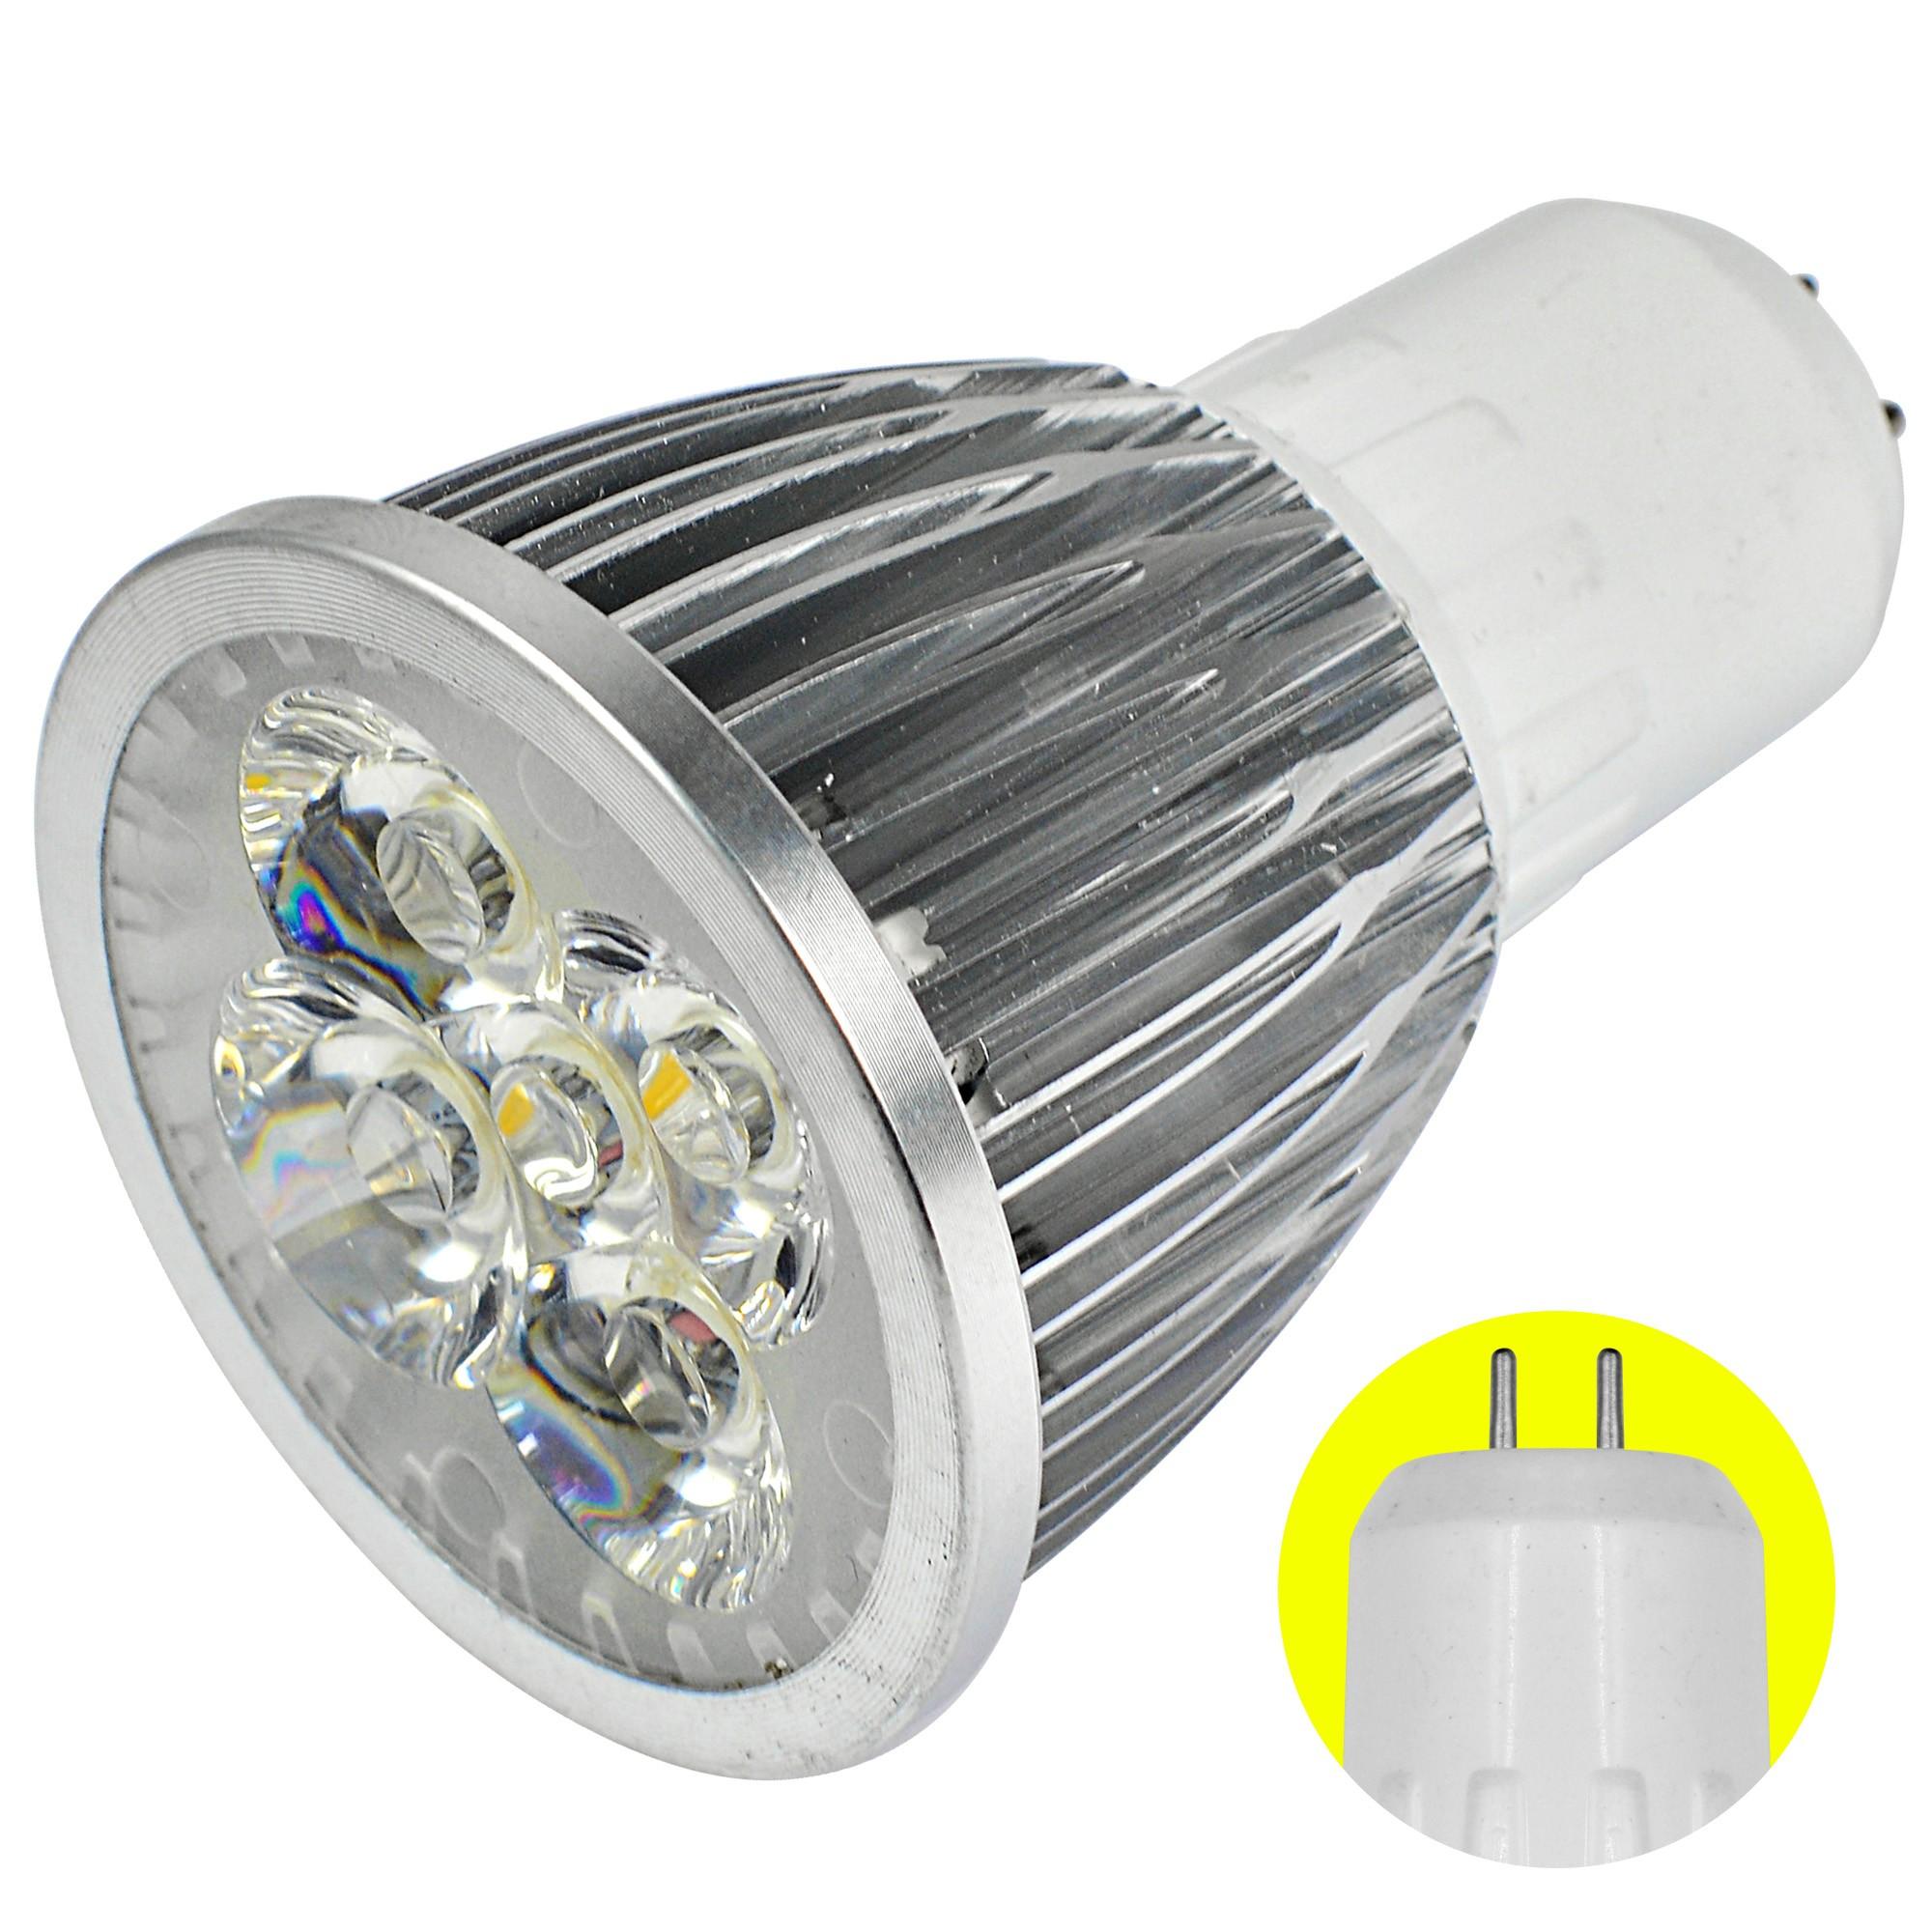 mengsled mengs gu5 3 5w led spotlight smd leds led lamp bulb in warm white cool white energy. Black Bedroom Furniture Sets. Home Design Ideas